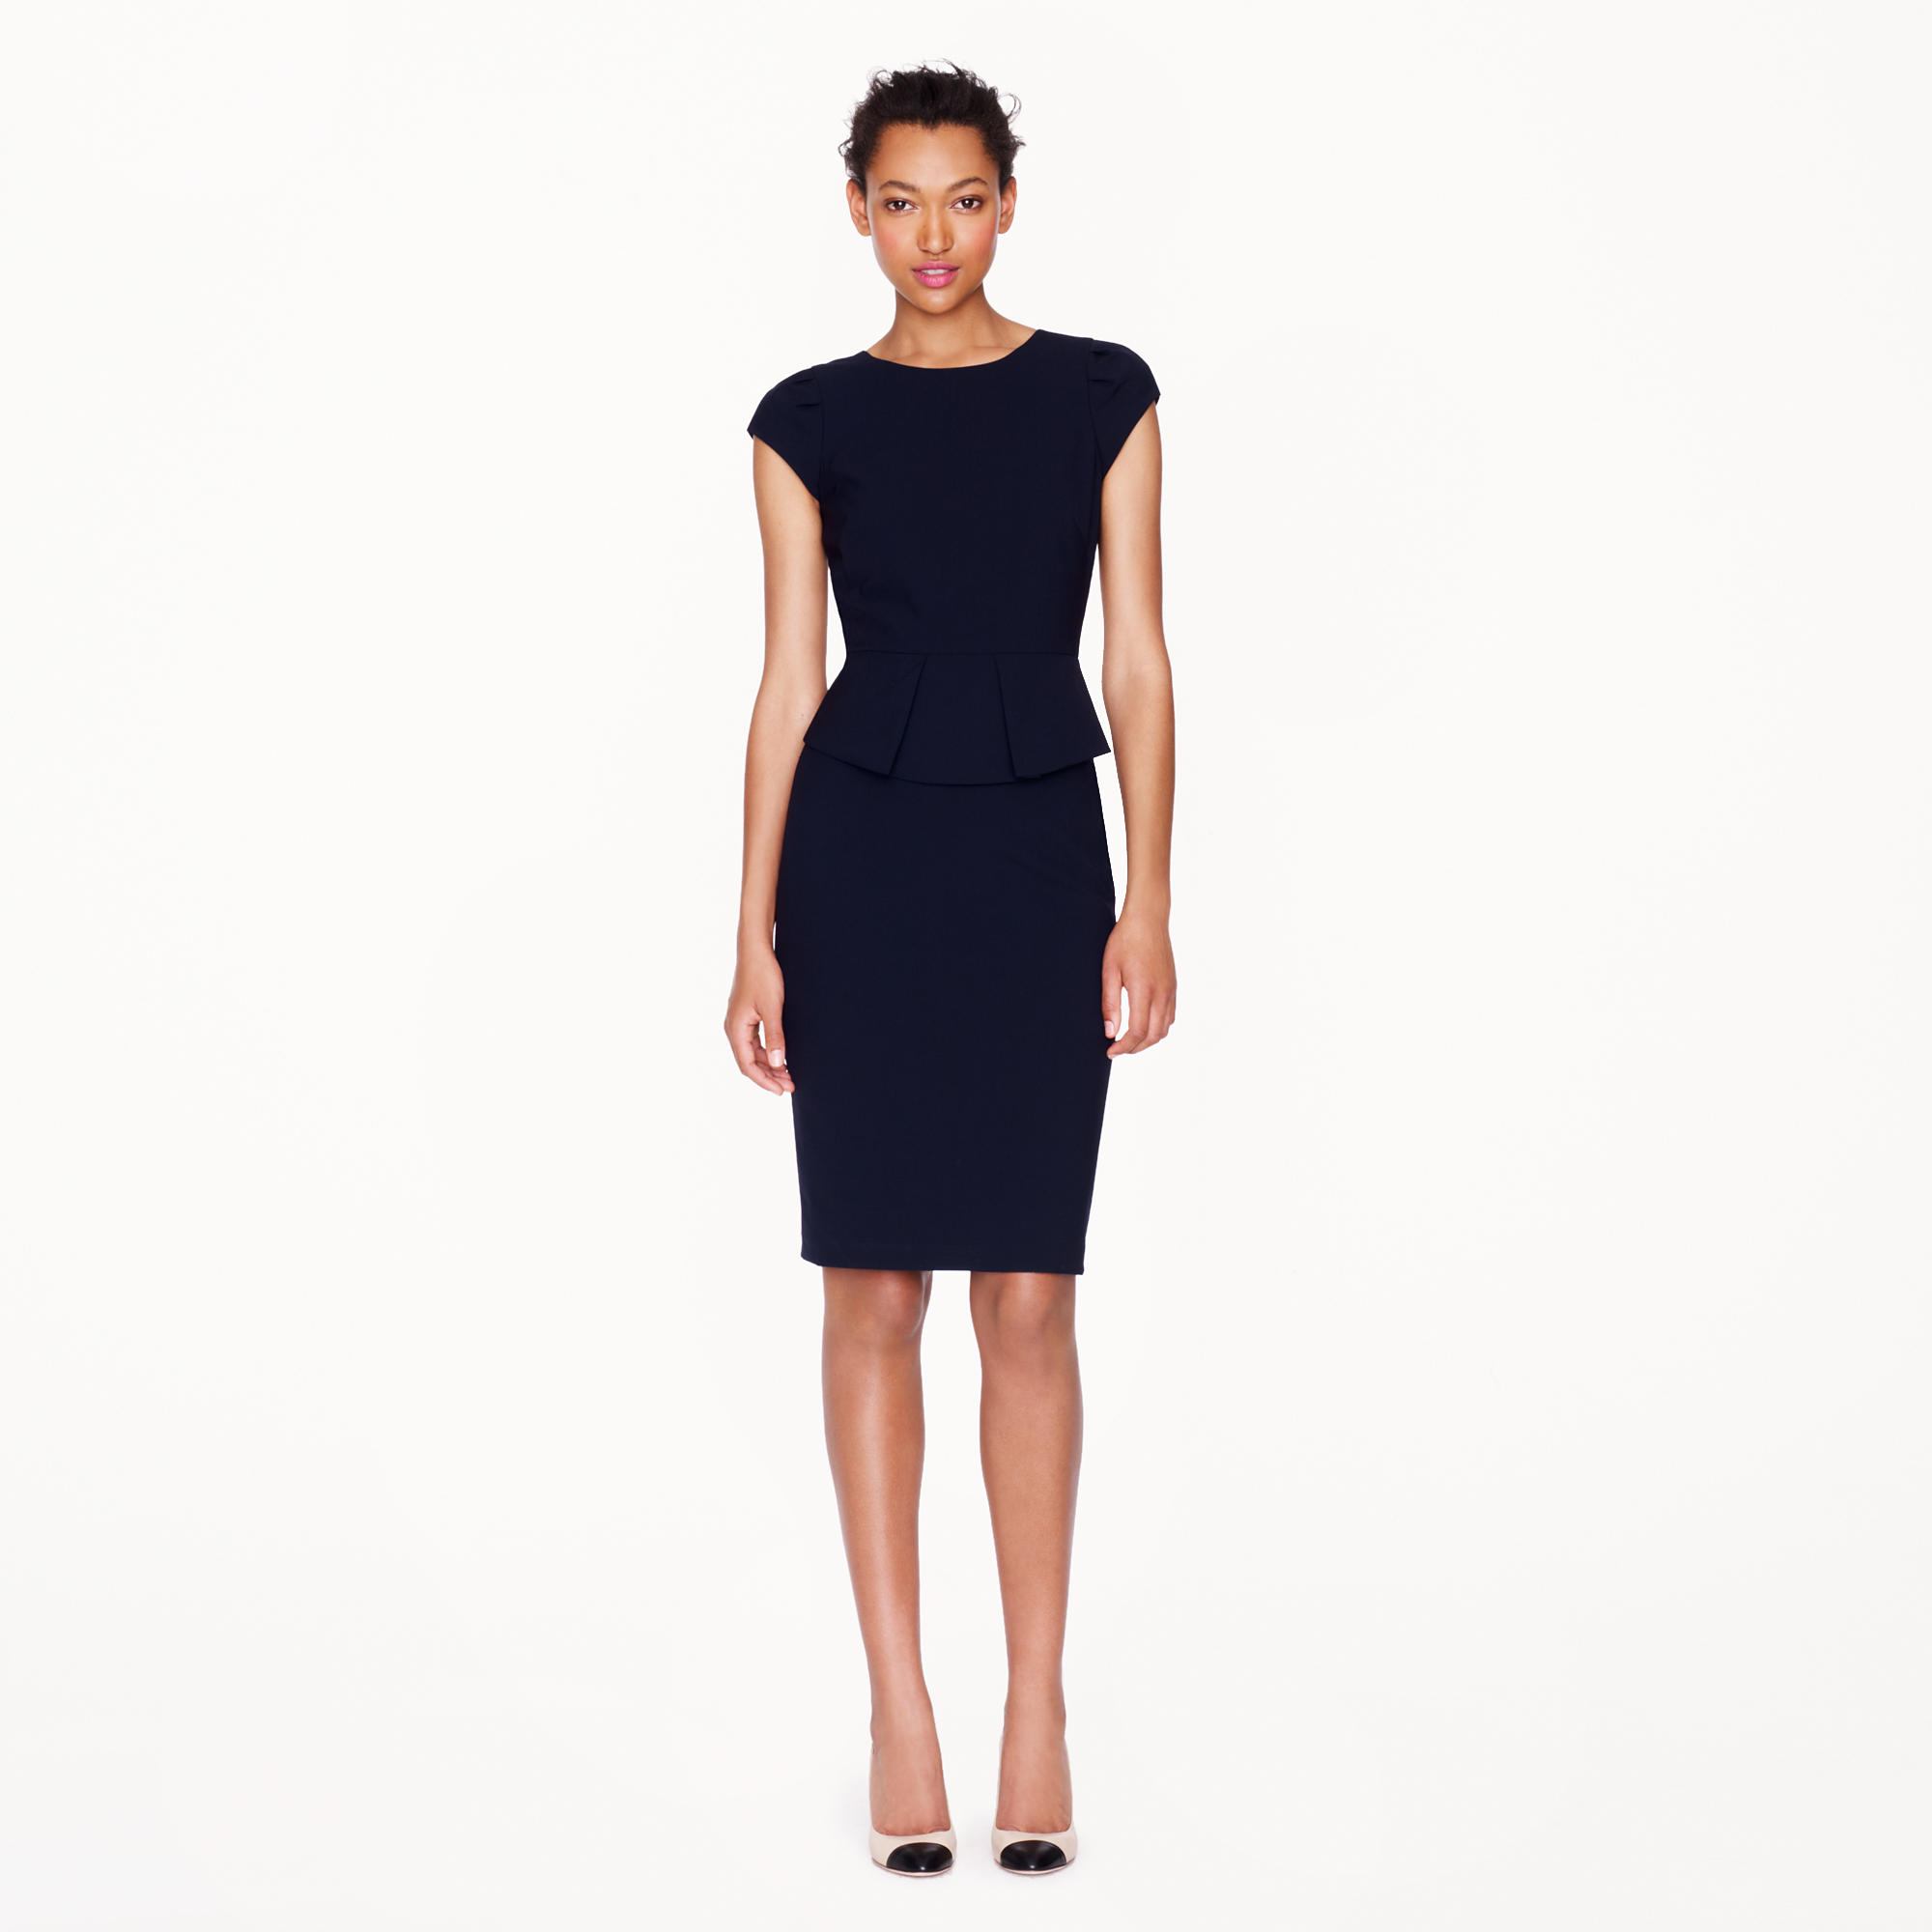 Black dress j crew - Peplum Dress In Stretch Wool